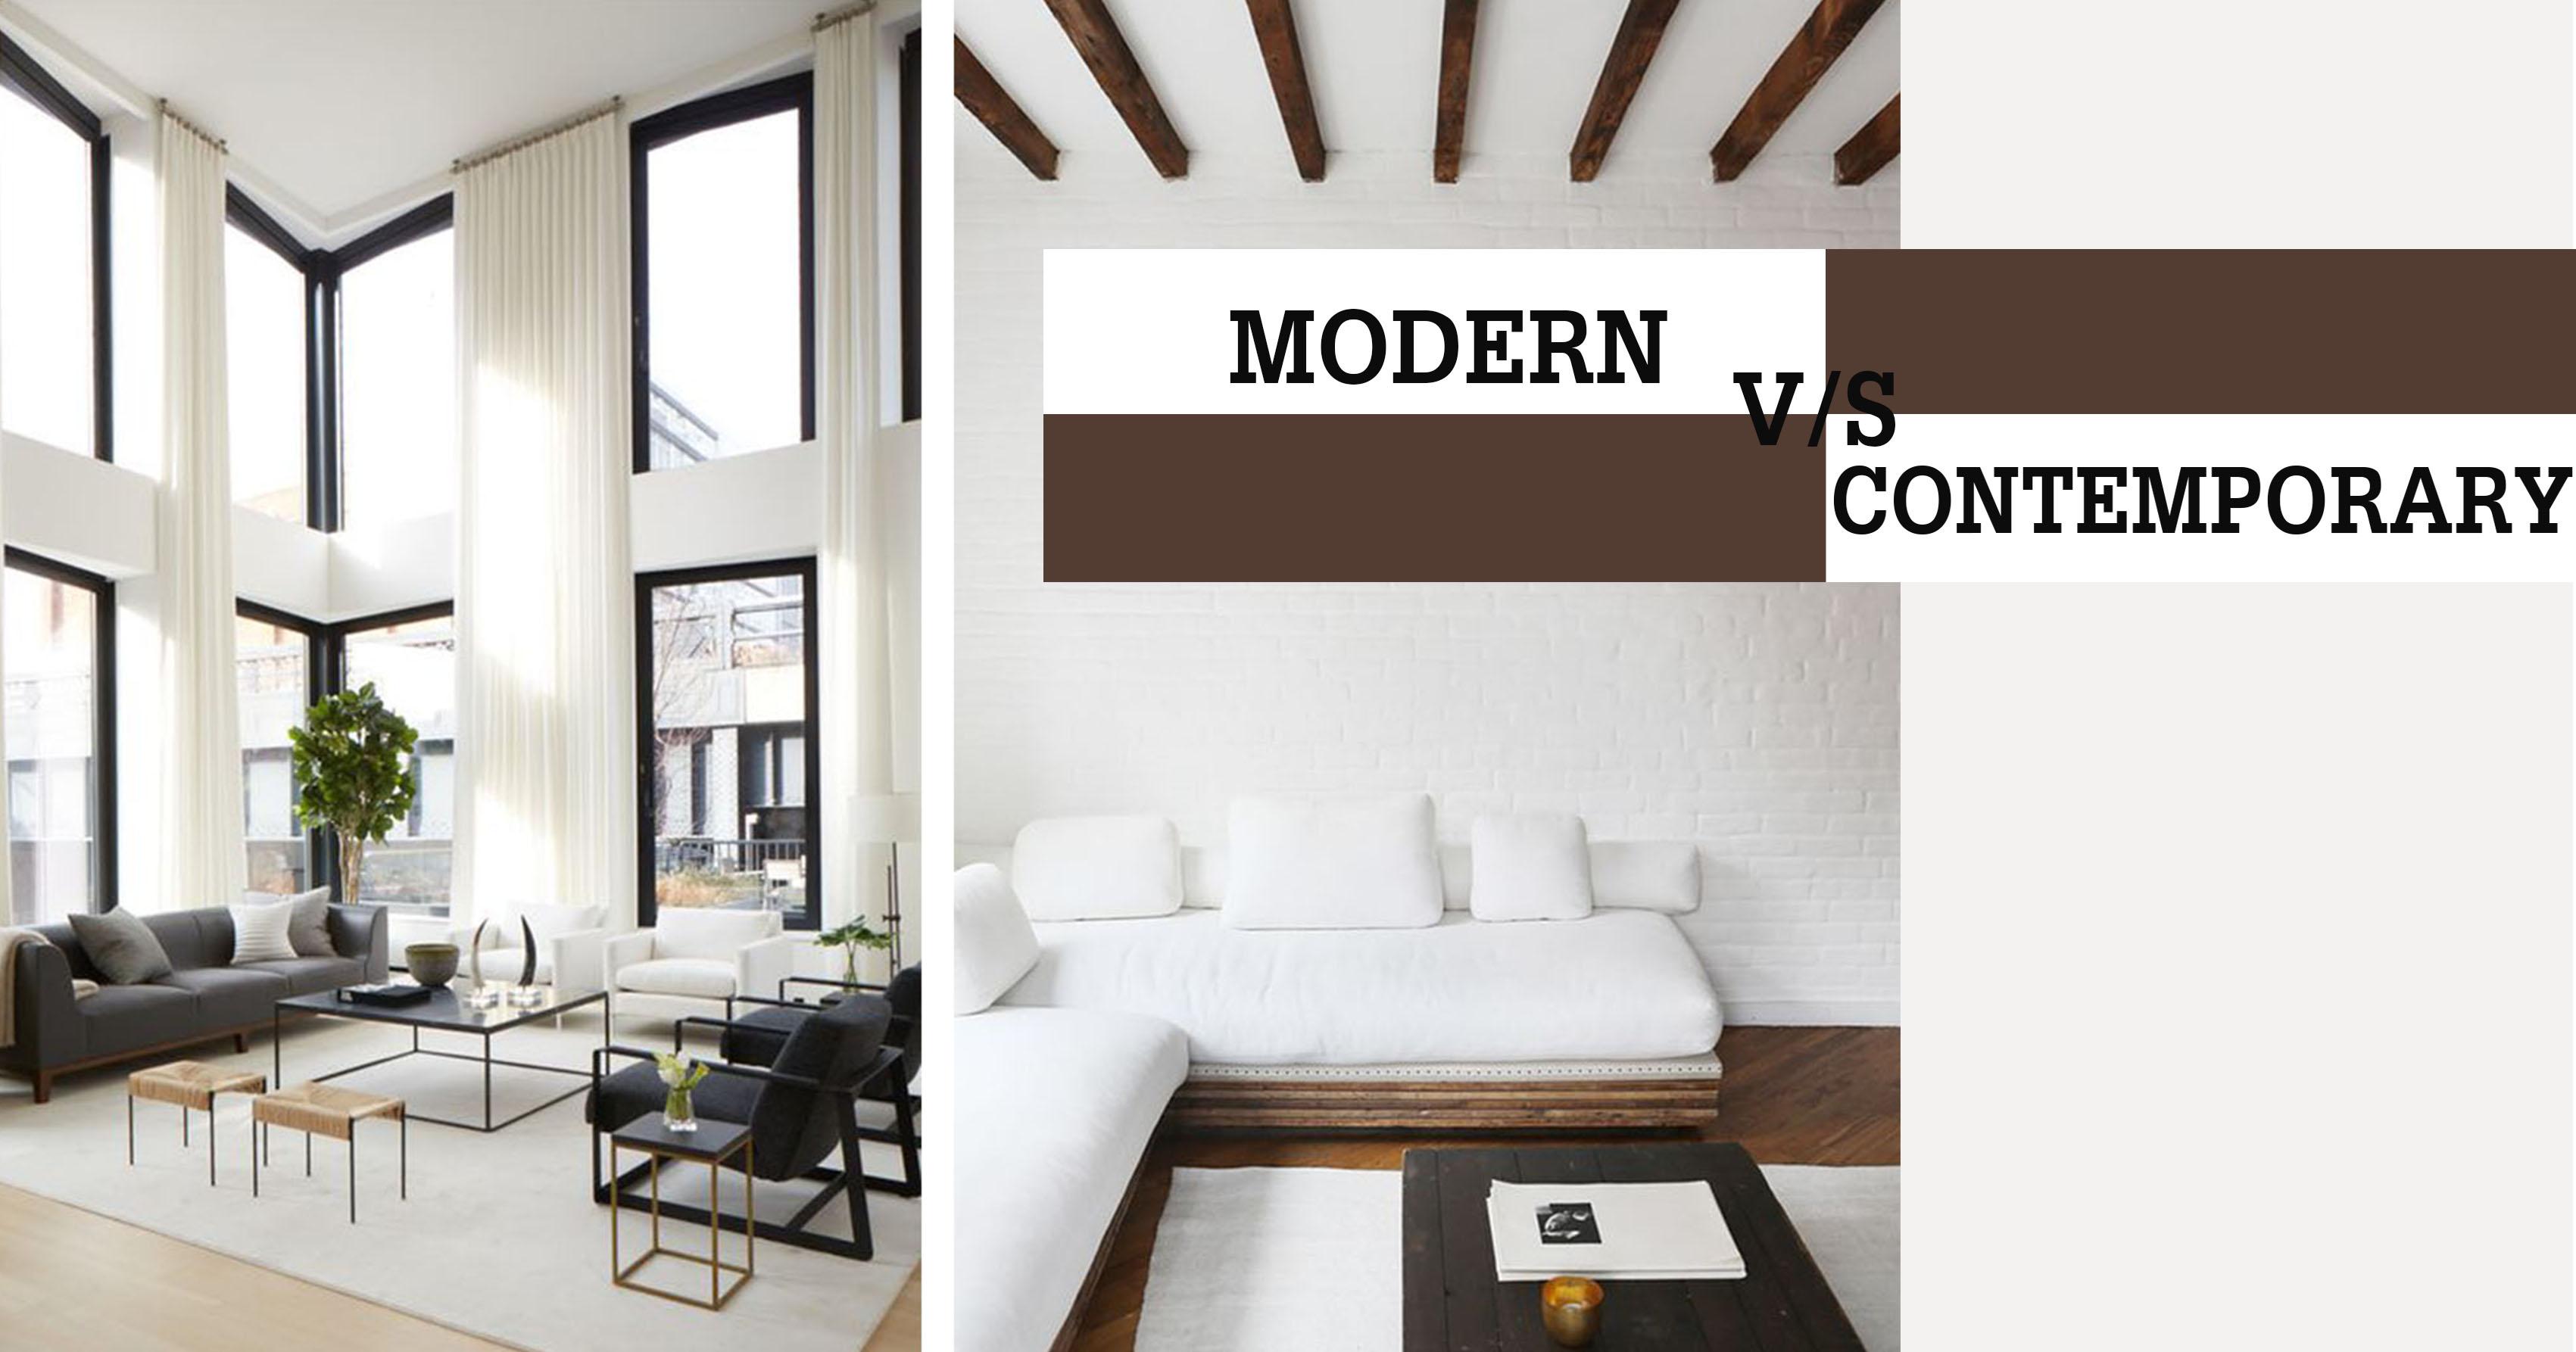 MODERN-VS-CONTEMPORARY